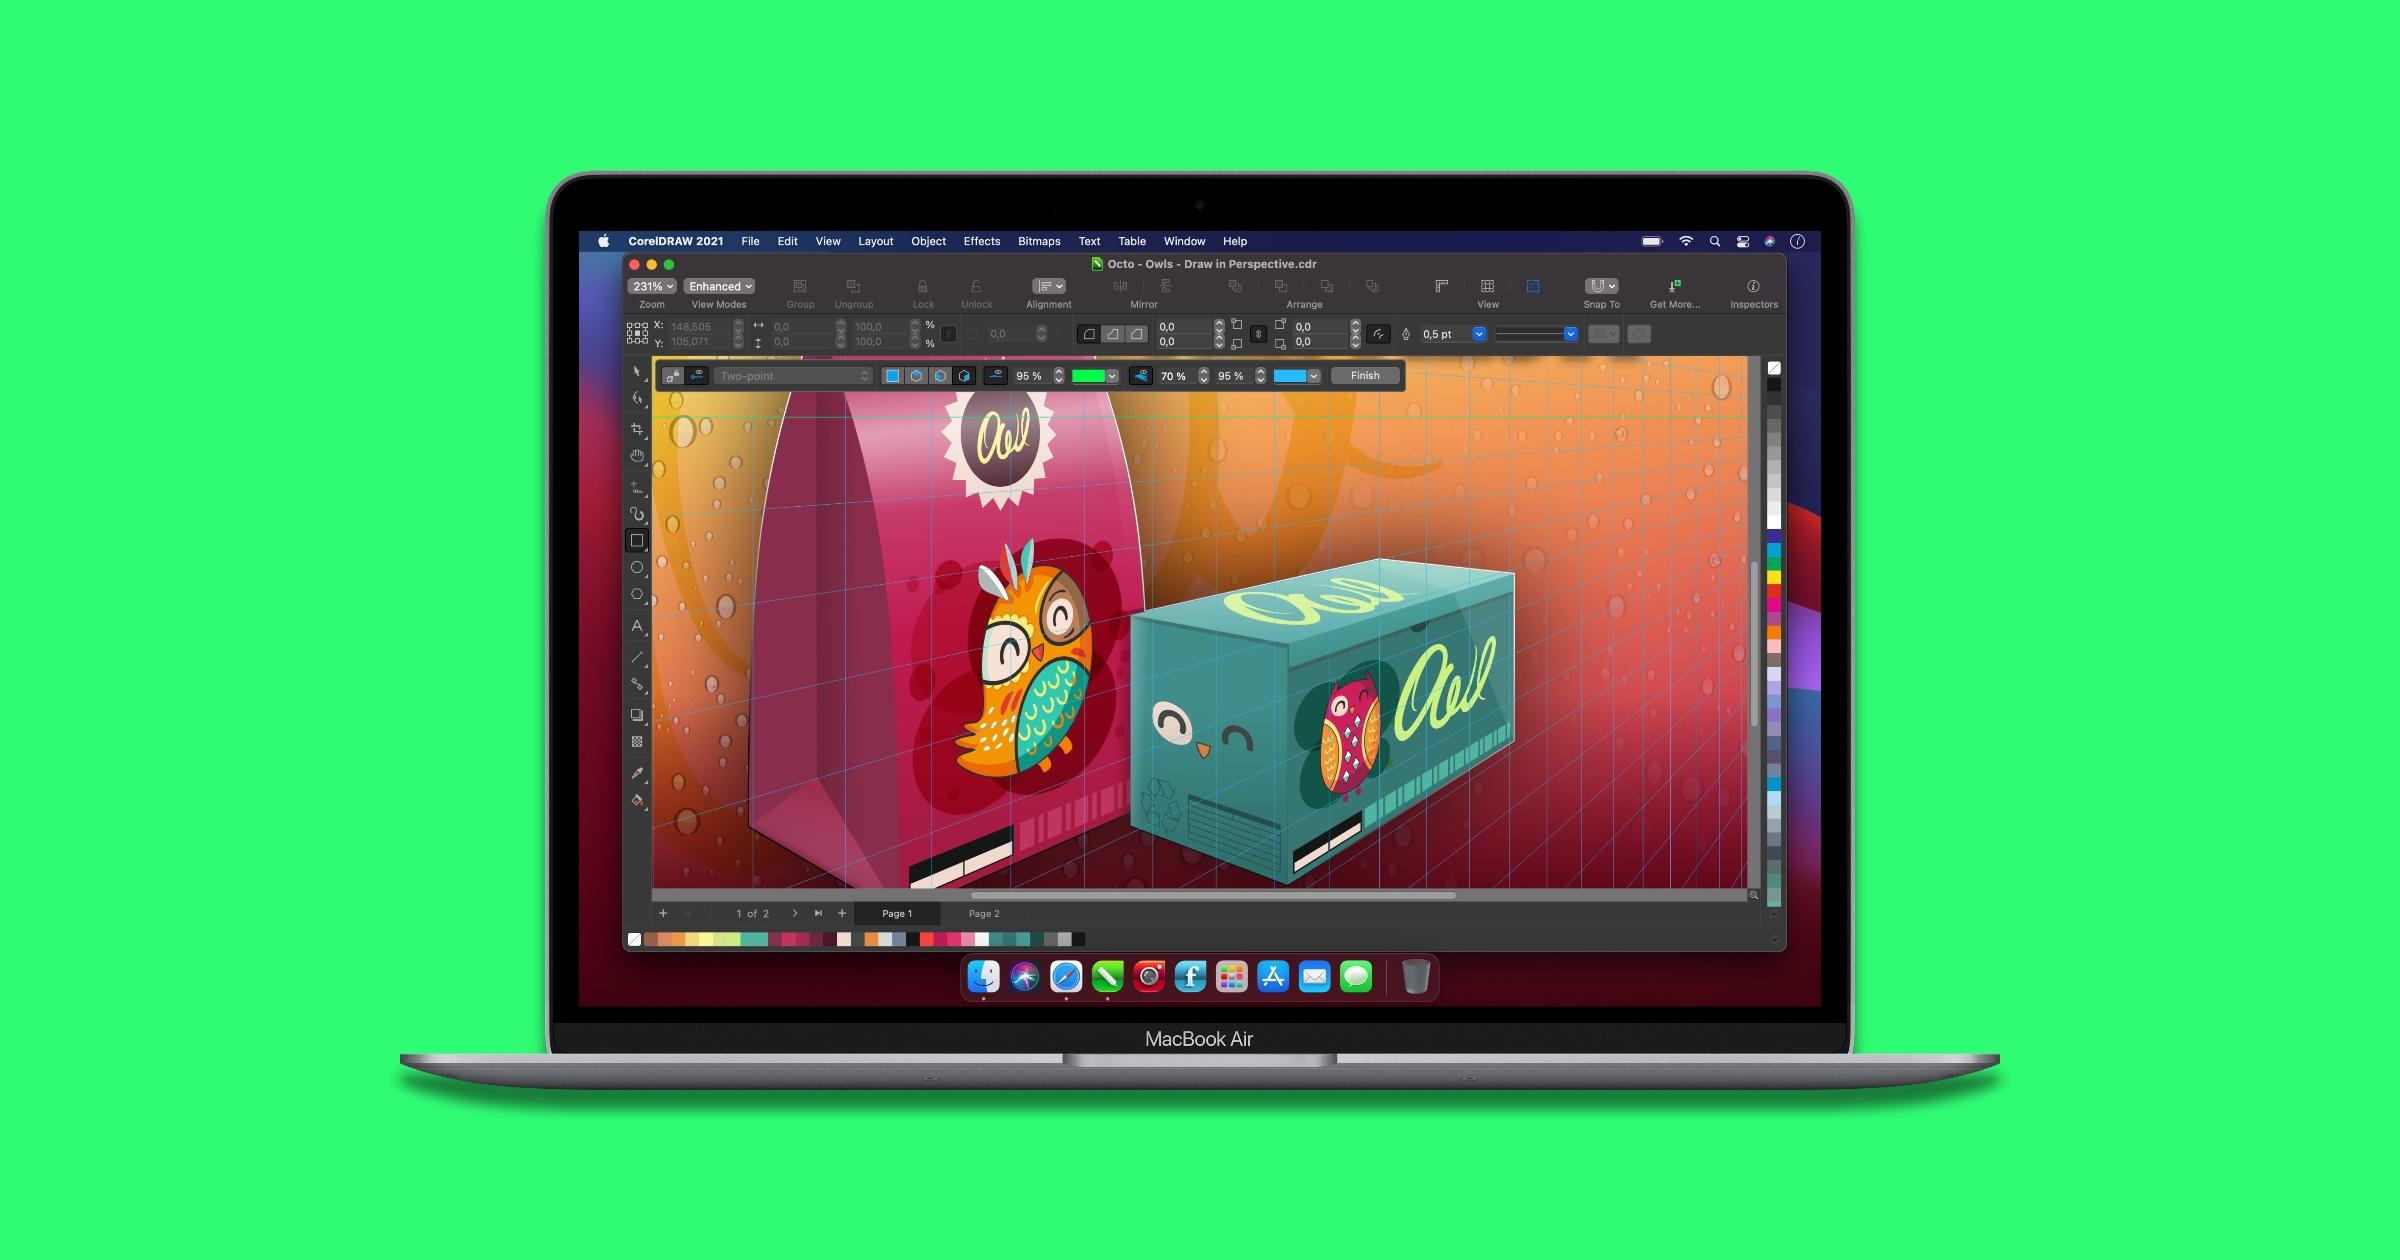 CorelDRAW Graphics Suite Adds iPad App, M1 Support